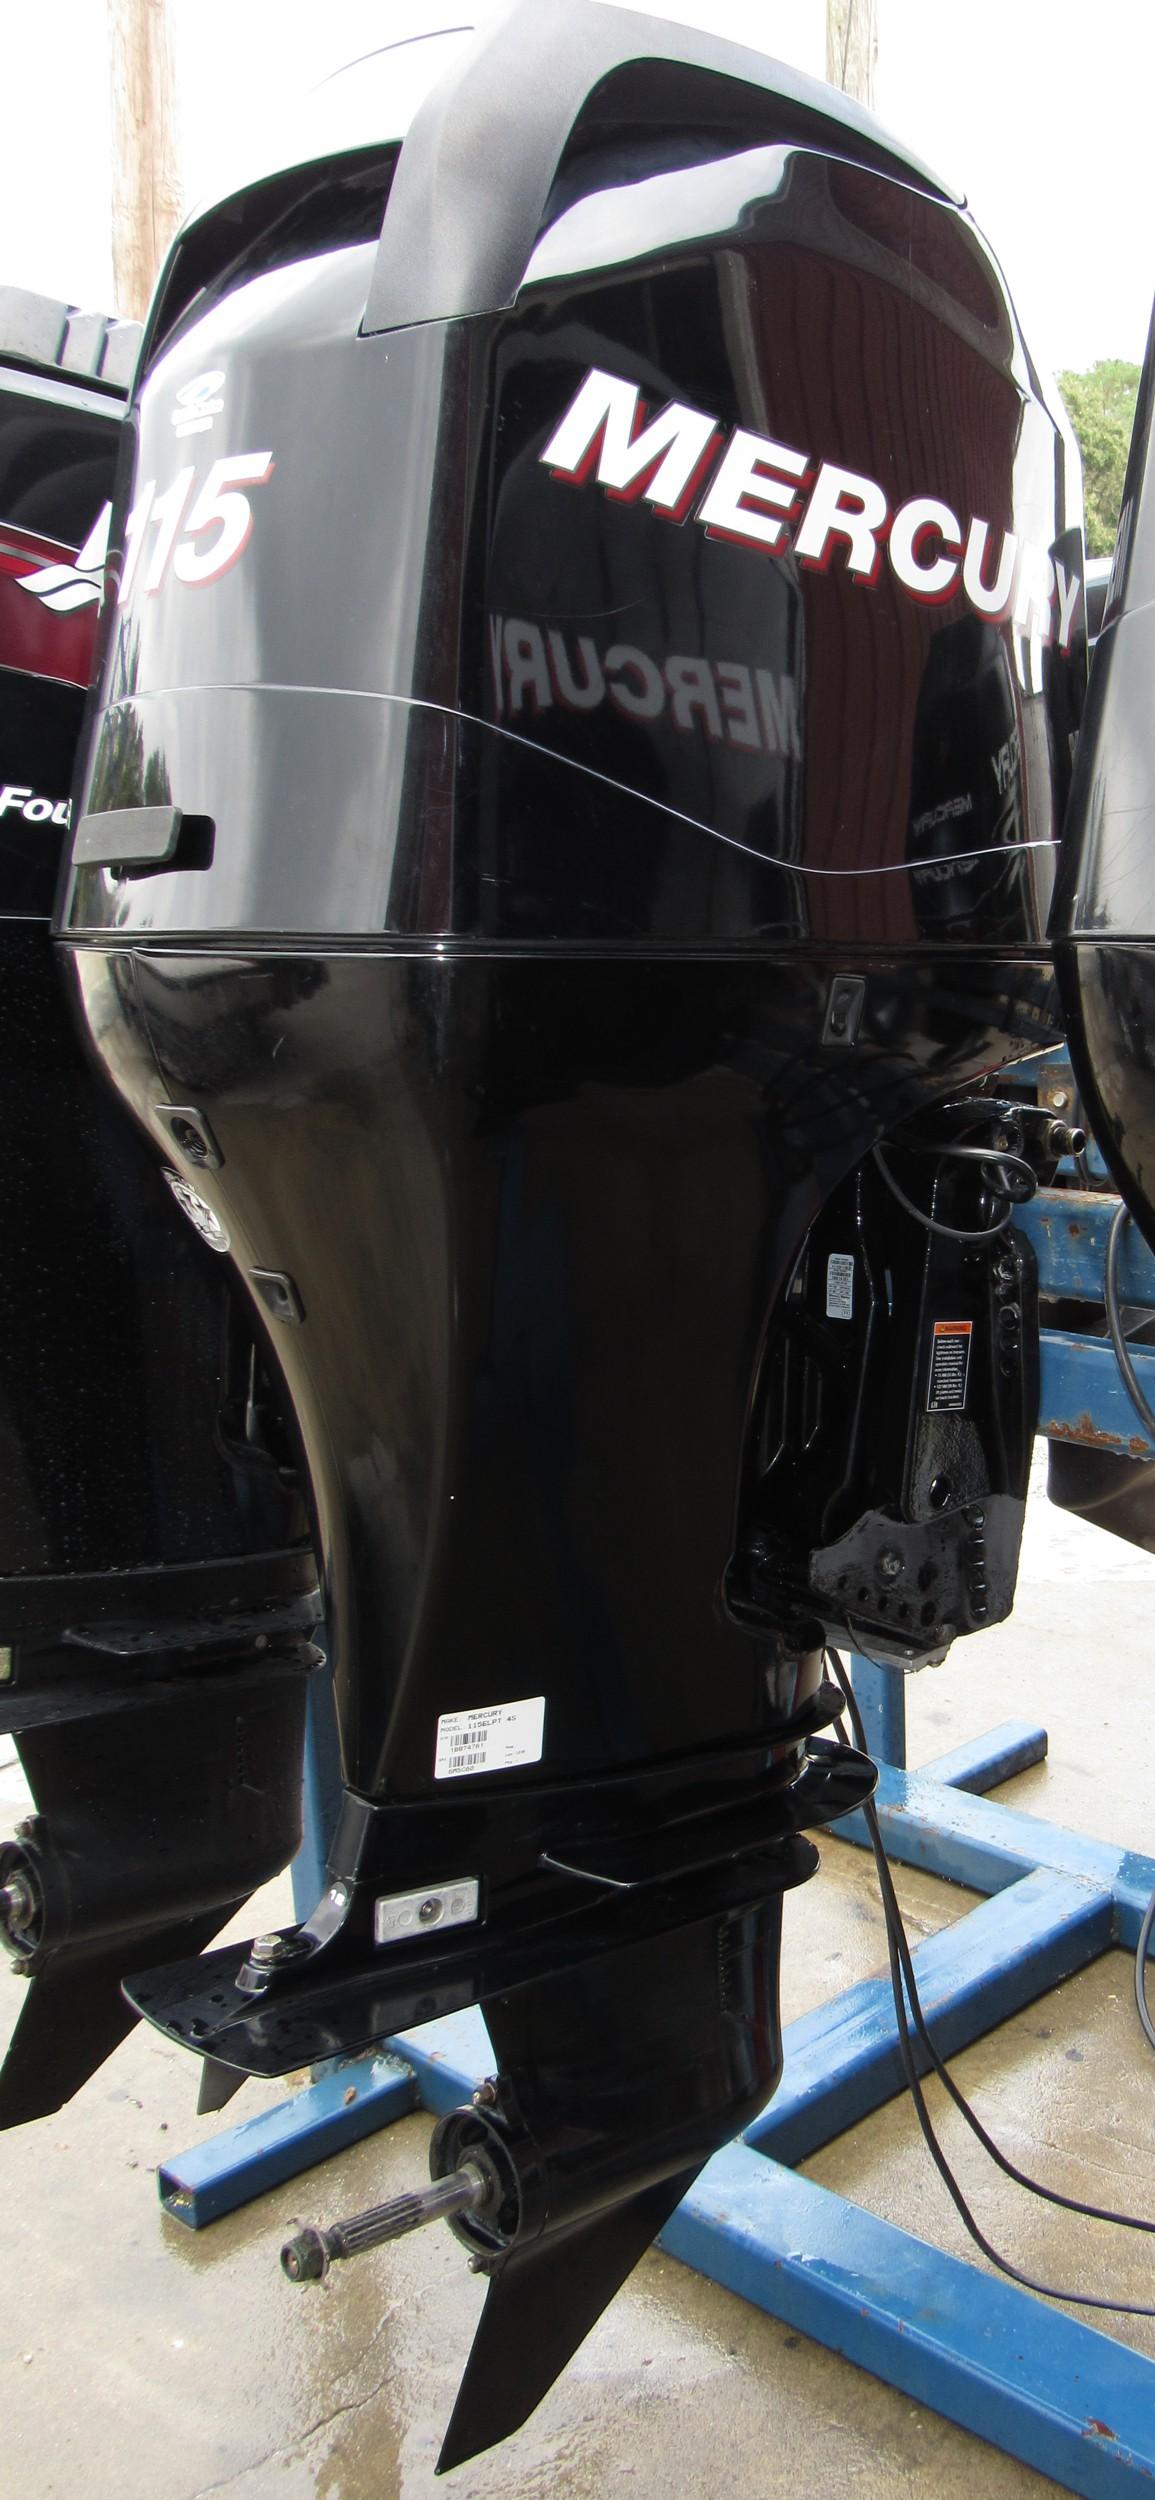 Used 2011 mercury 115elpt 115hp 4 stroke outboard boat for Mercury boat motor props